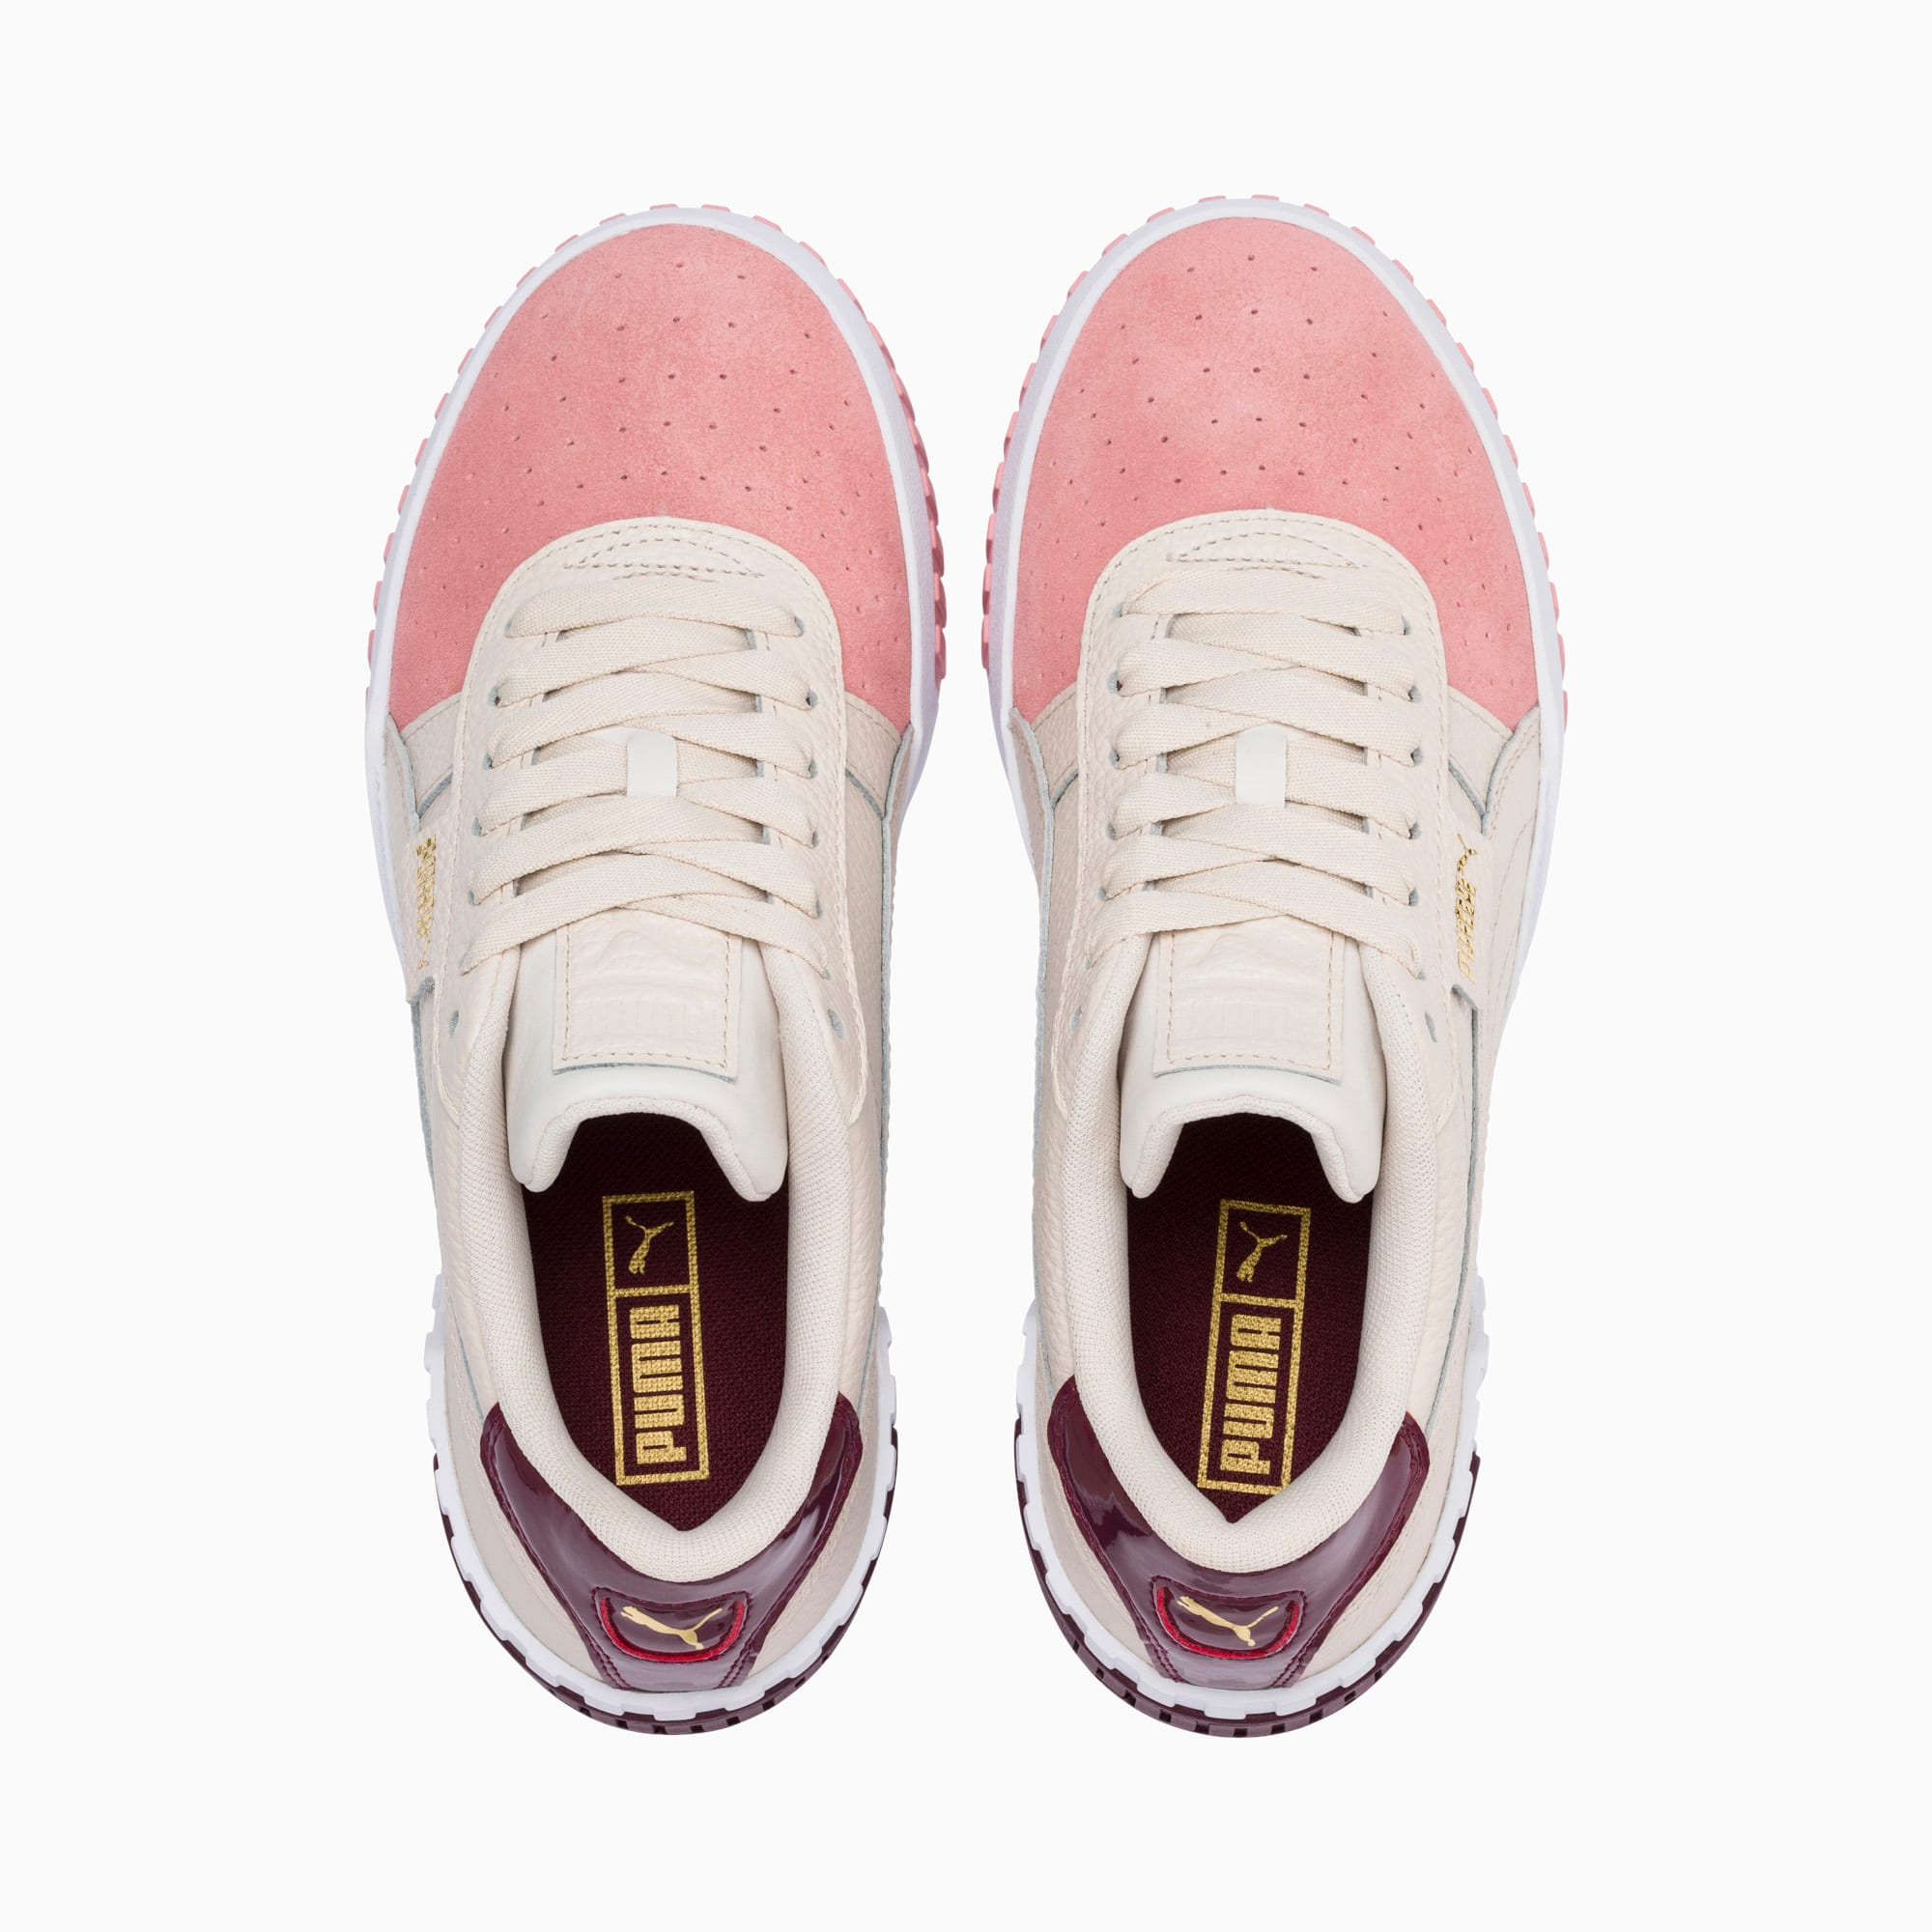 Cali Remix Women's Sneakers